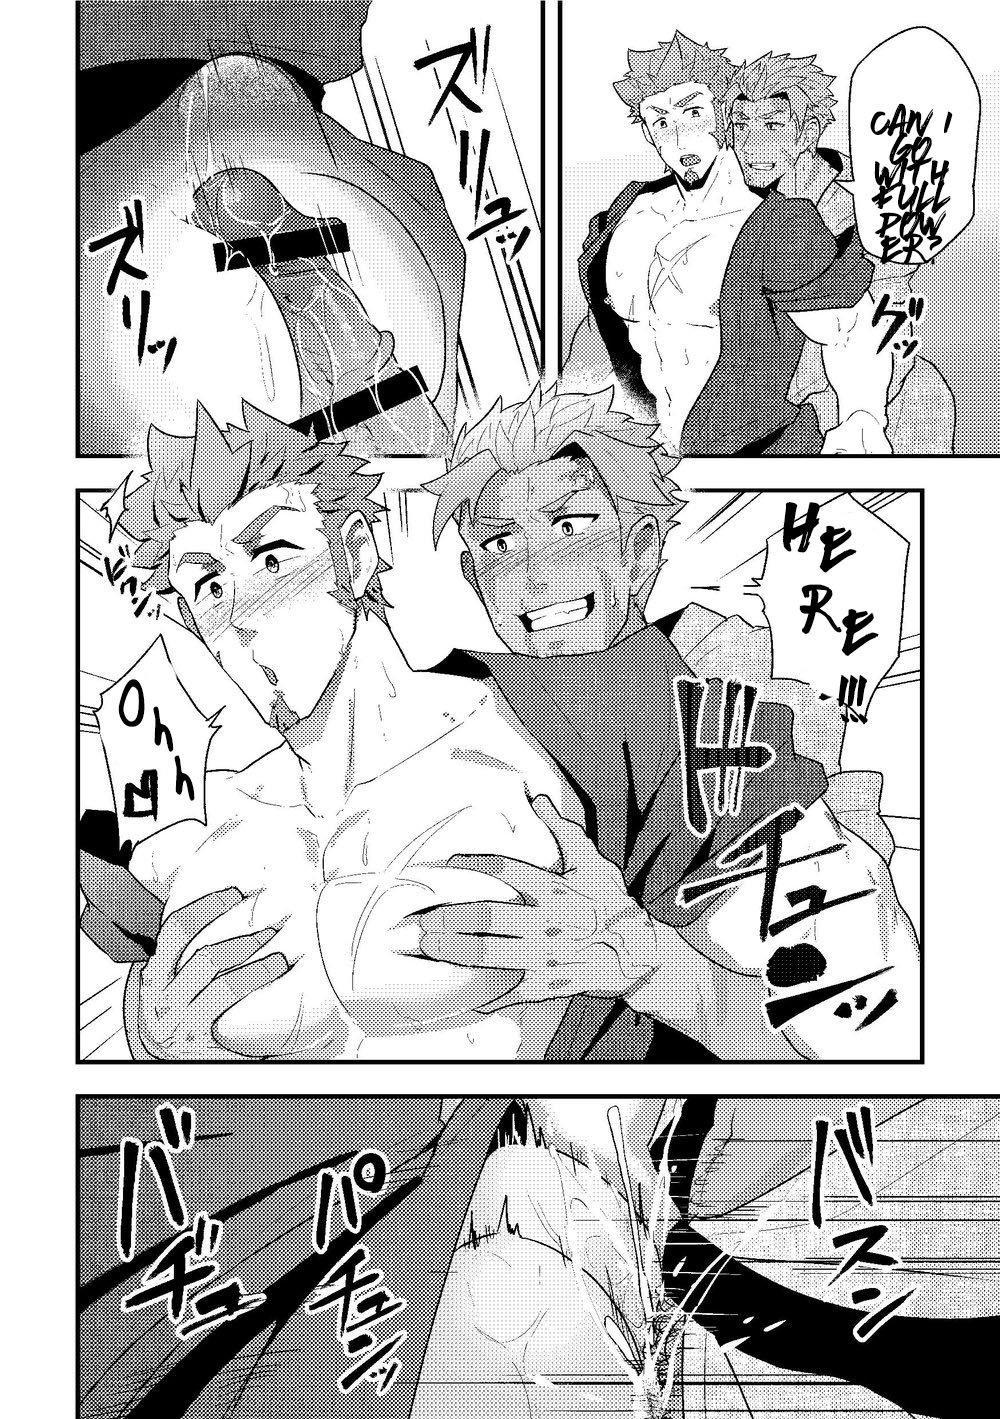 """Sakki no Hanashi no Tsuzuki to Ikou ze.""   Let's keep talking about that 10"